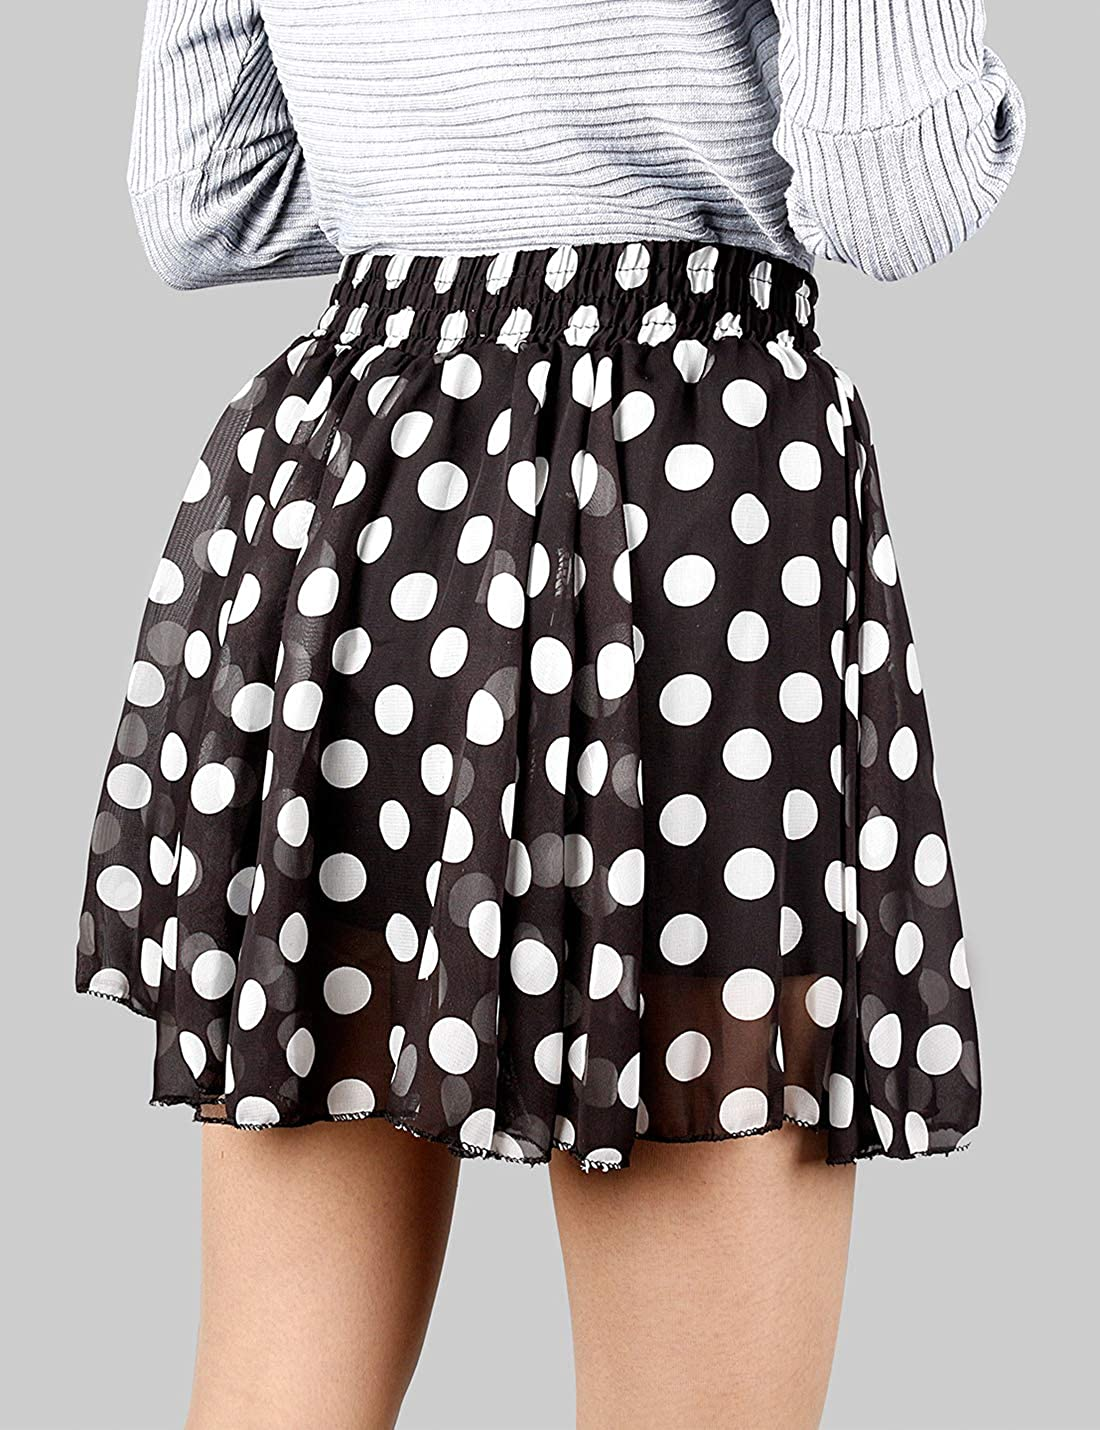 Uaneo Women's Spring Casual Elastic Waist Floral Dot Print Ruffled Mini Skirts (Black, X-Small)